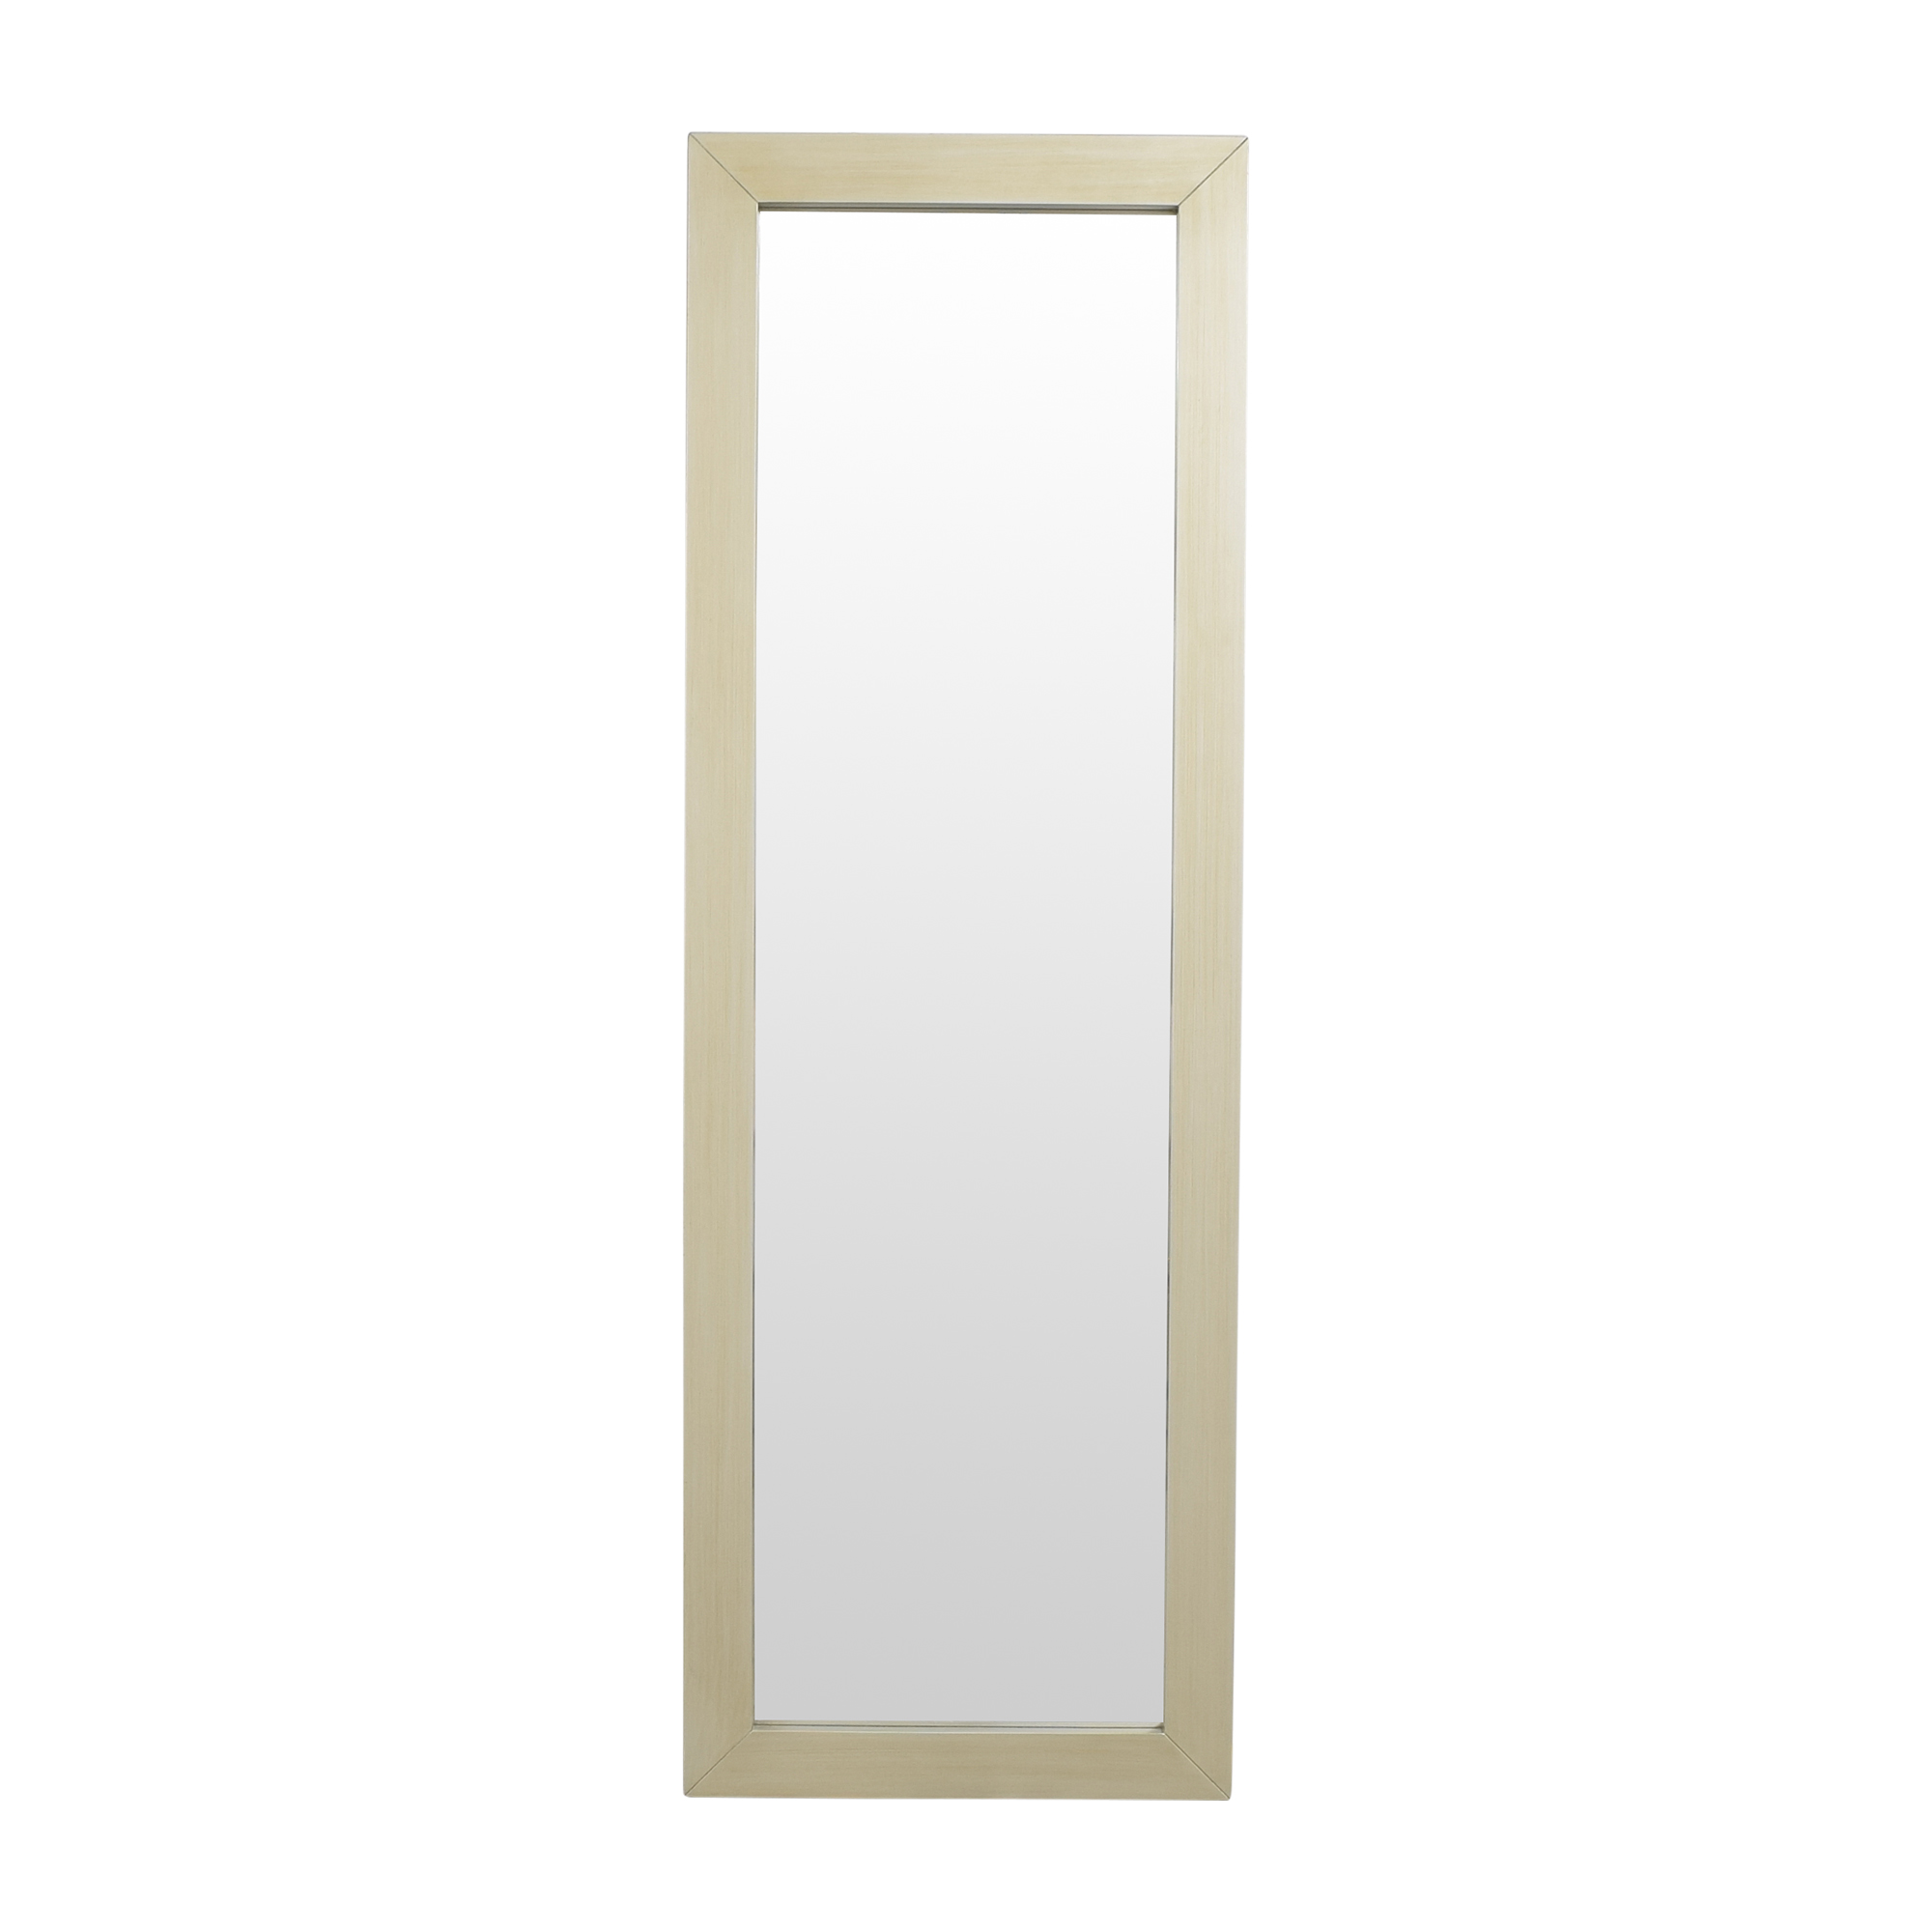 West Elm West Elm Parsons Floor Mirror for sale